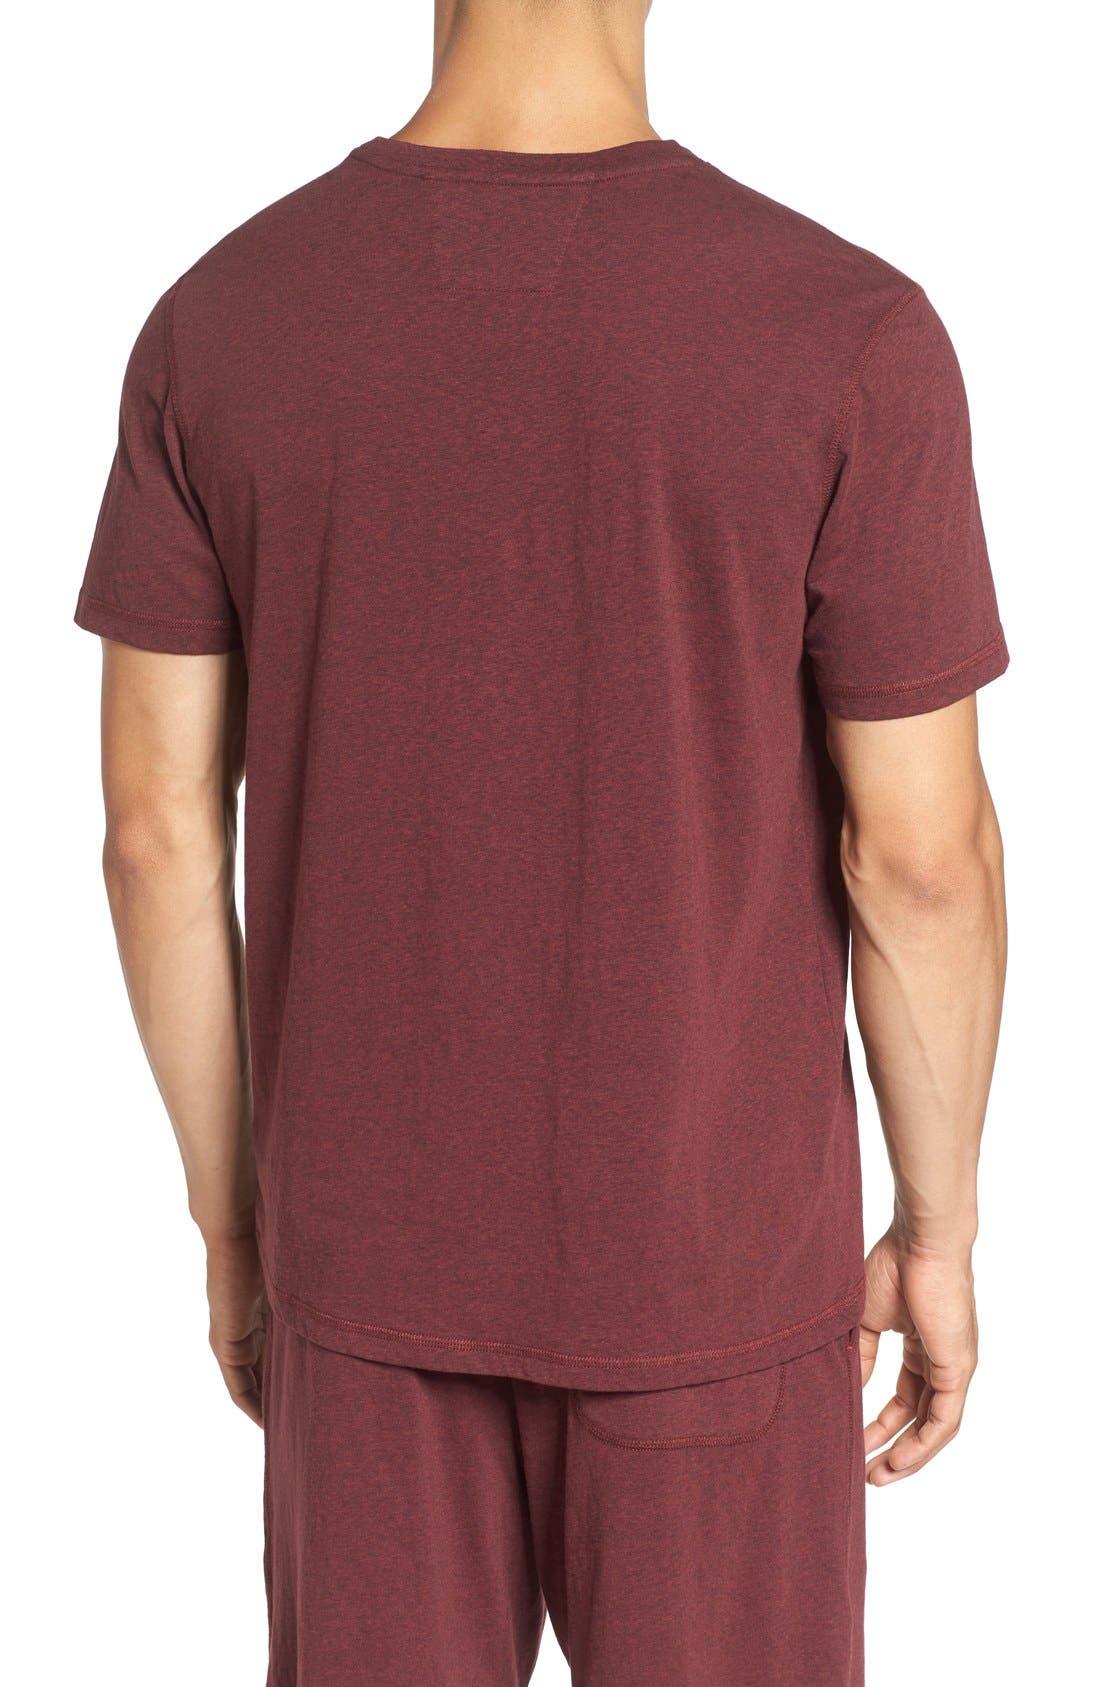 Alternate Image 2  - Daniel Buchler Recycled Cotton Blend T-Shirt